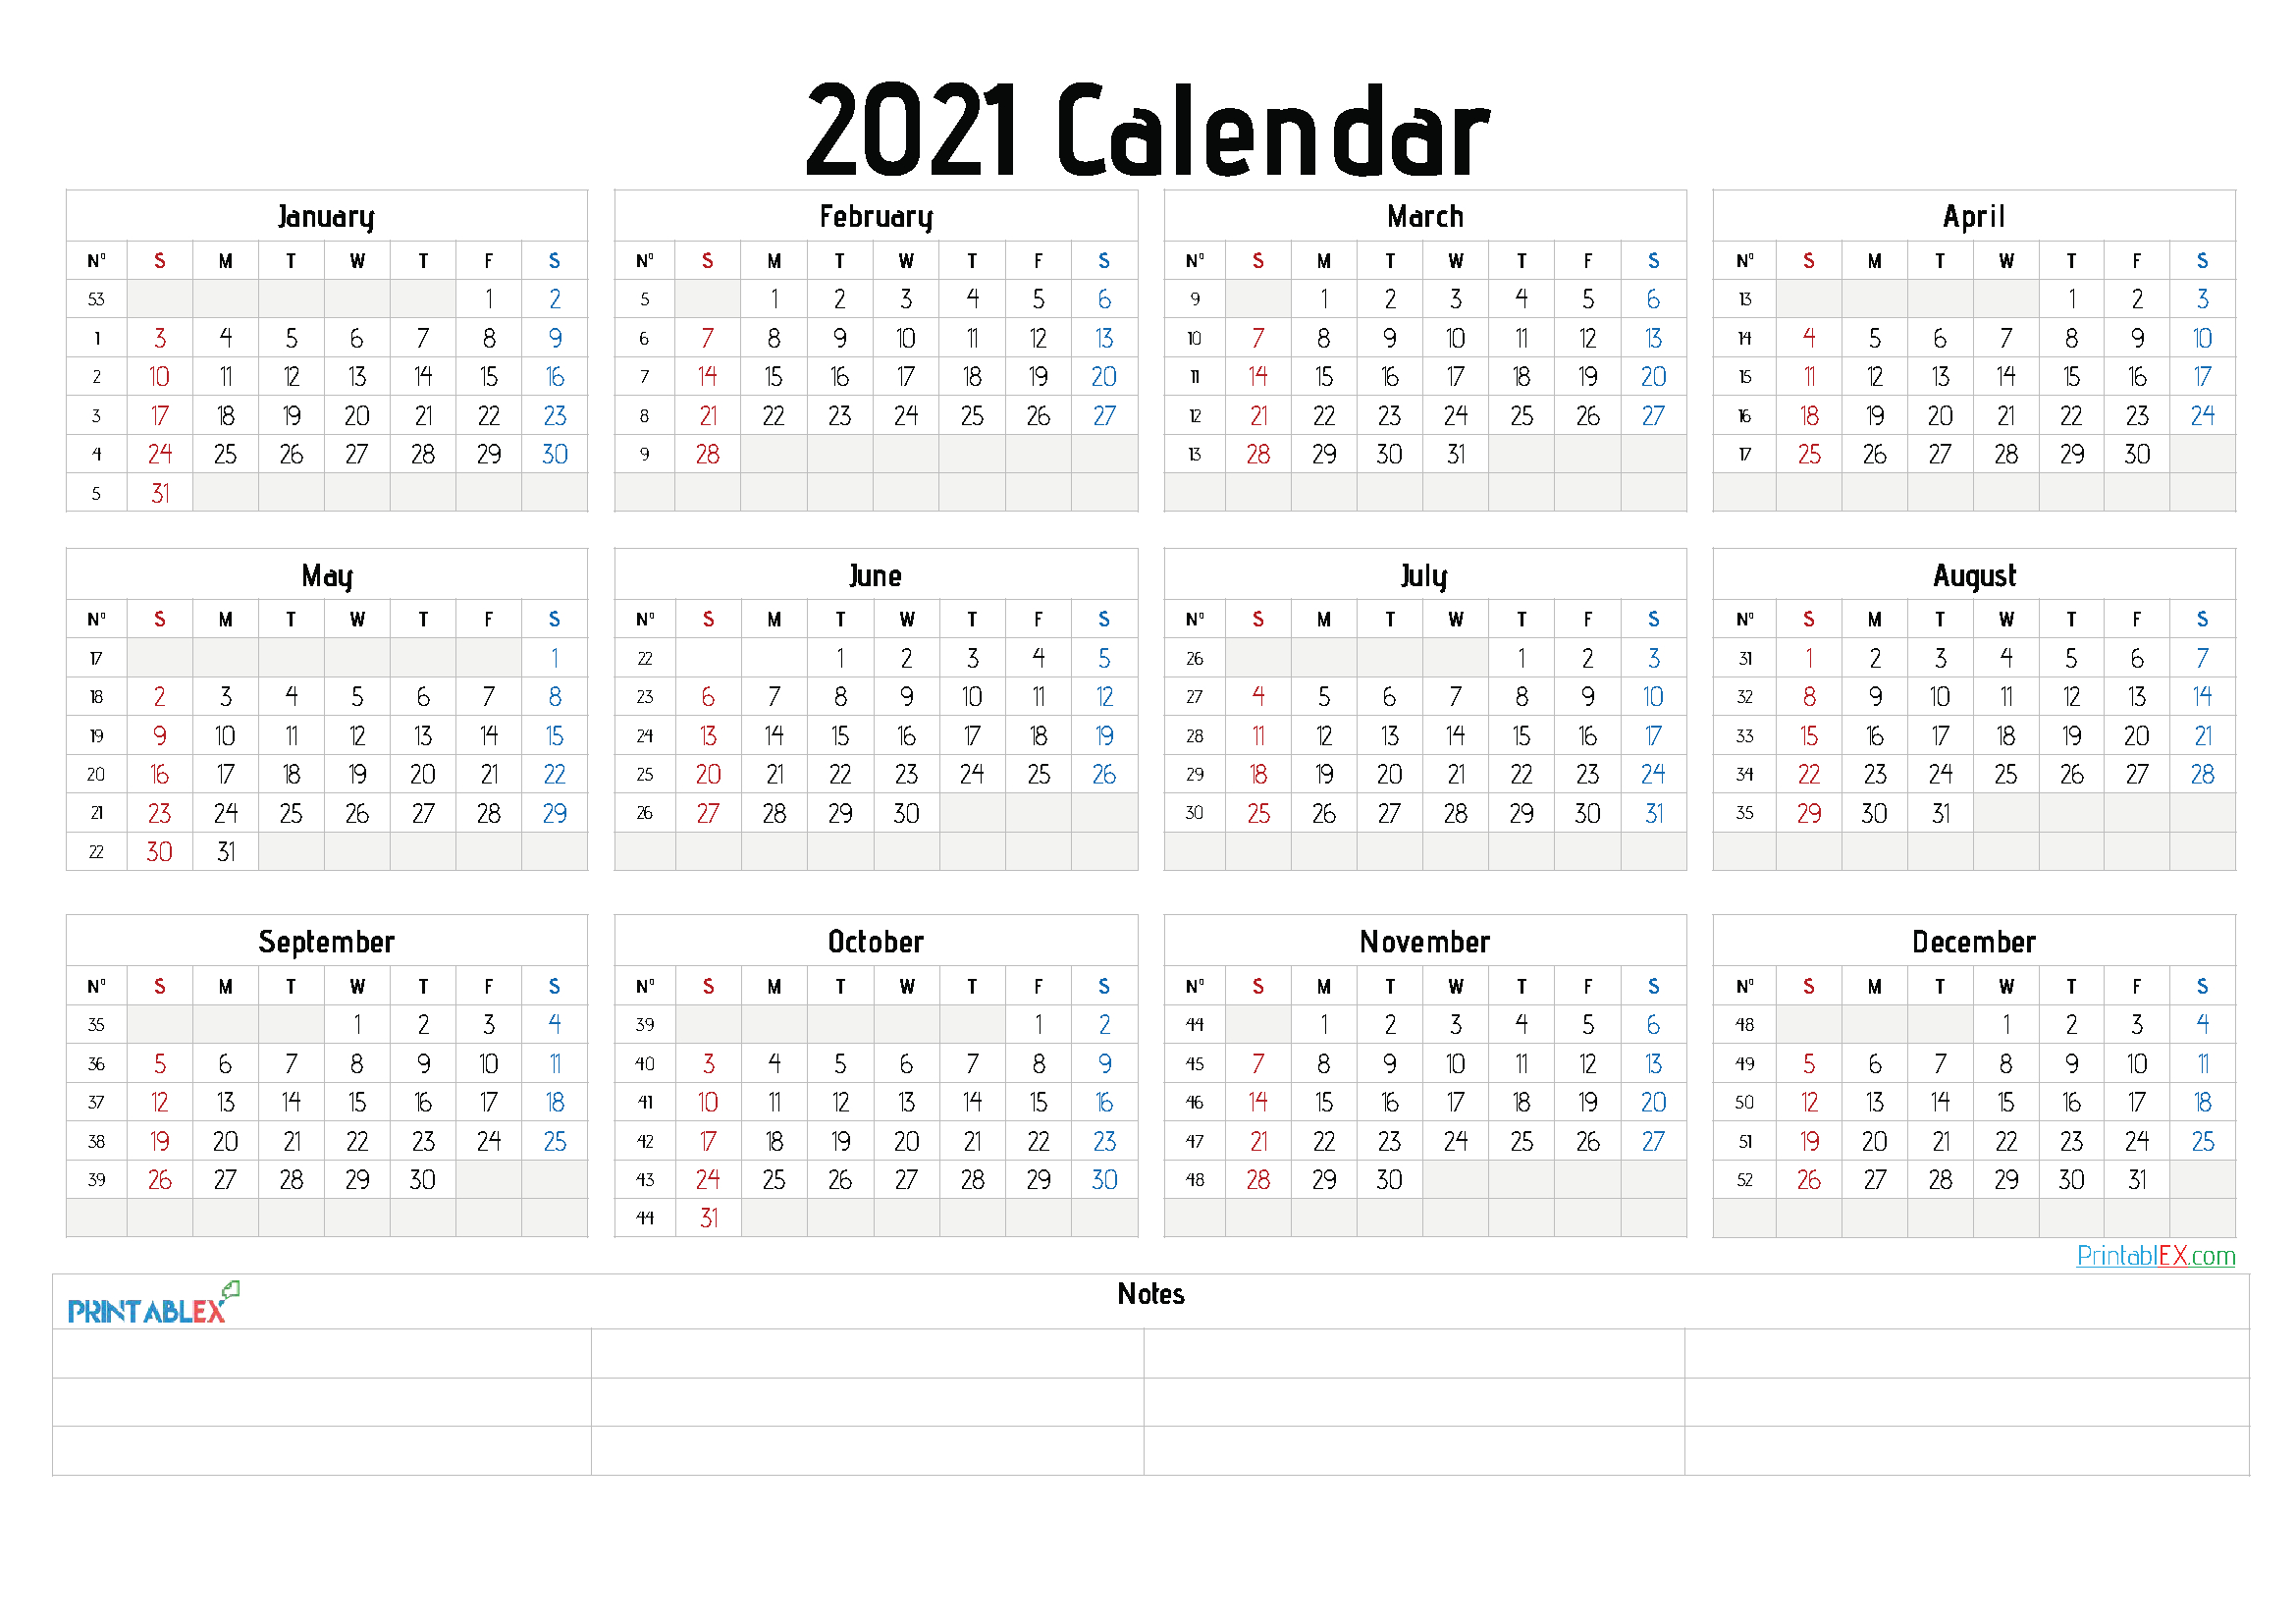 2021 Calendar Editable Free : Free 2021 Printable Calendar throughout 2021 Word Calendar Wincalendar